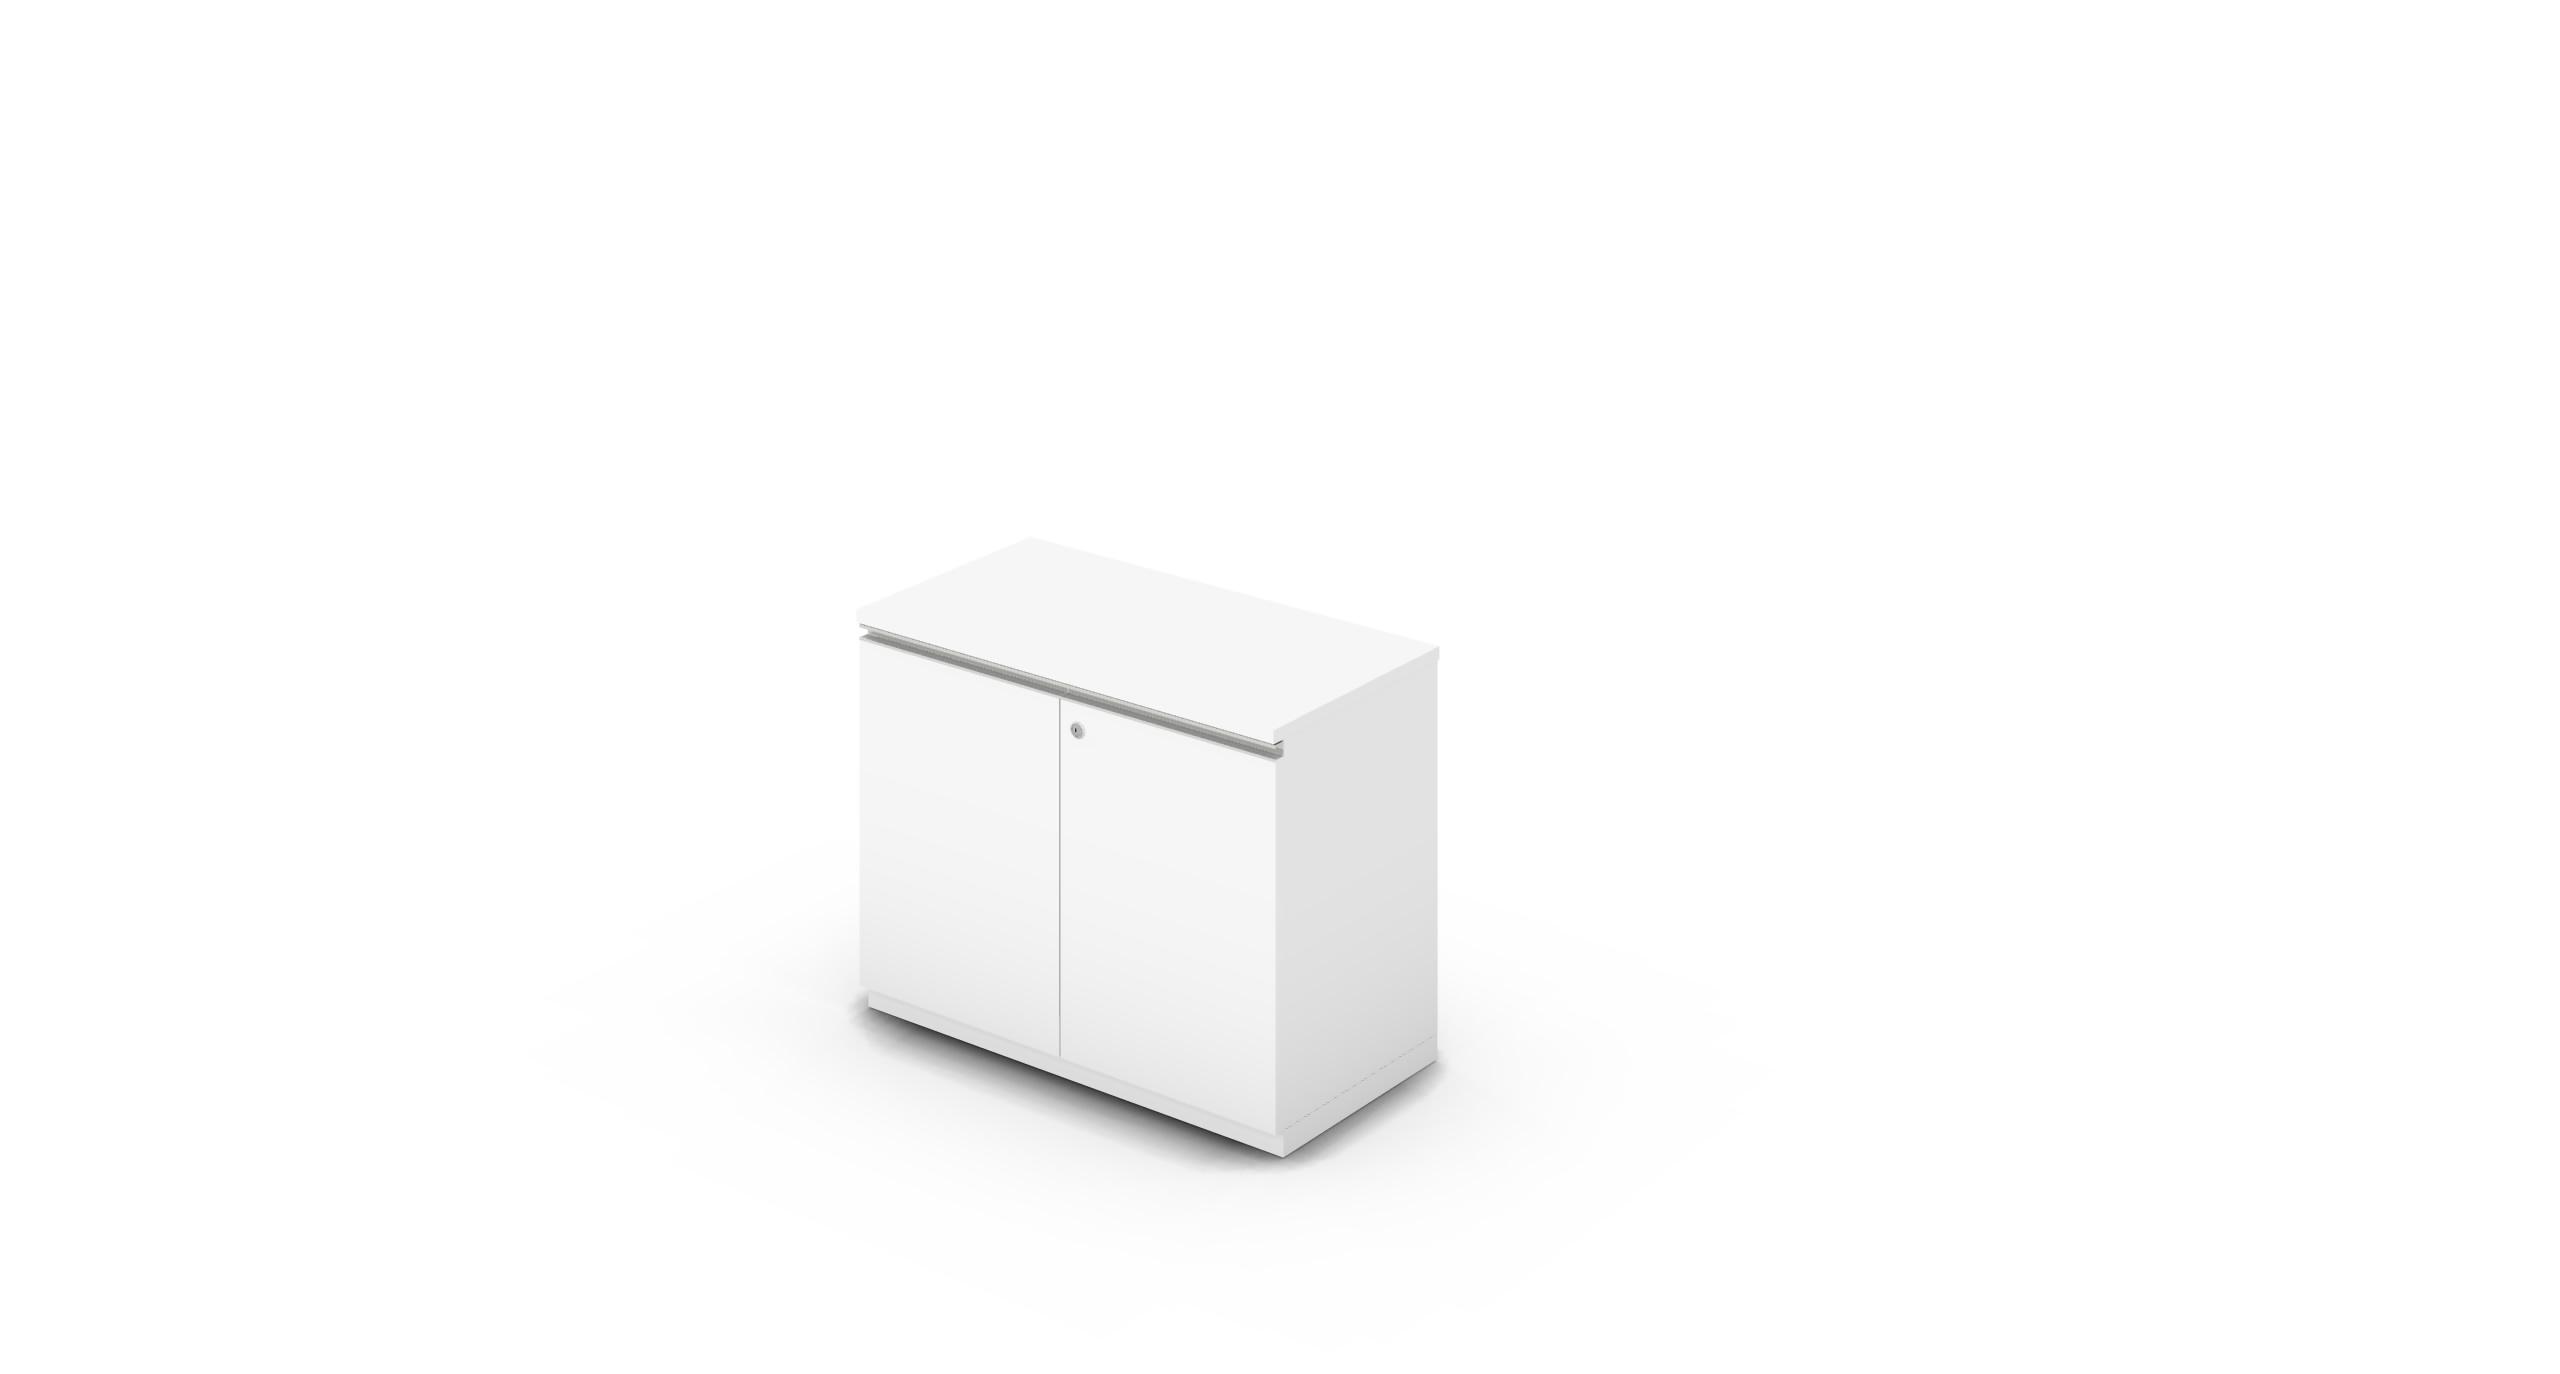 Cabinet_900x450x775_HD_White_Rail_WithCylinder